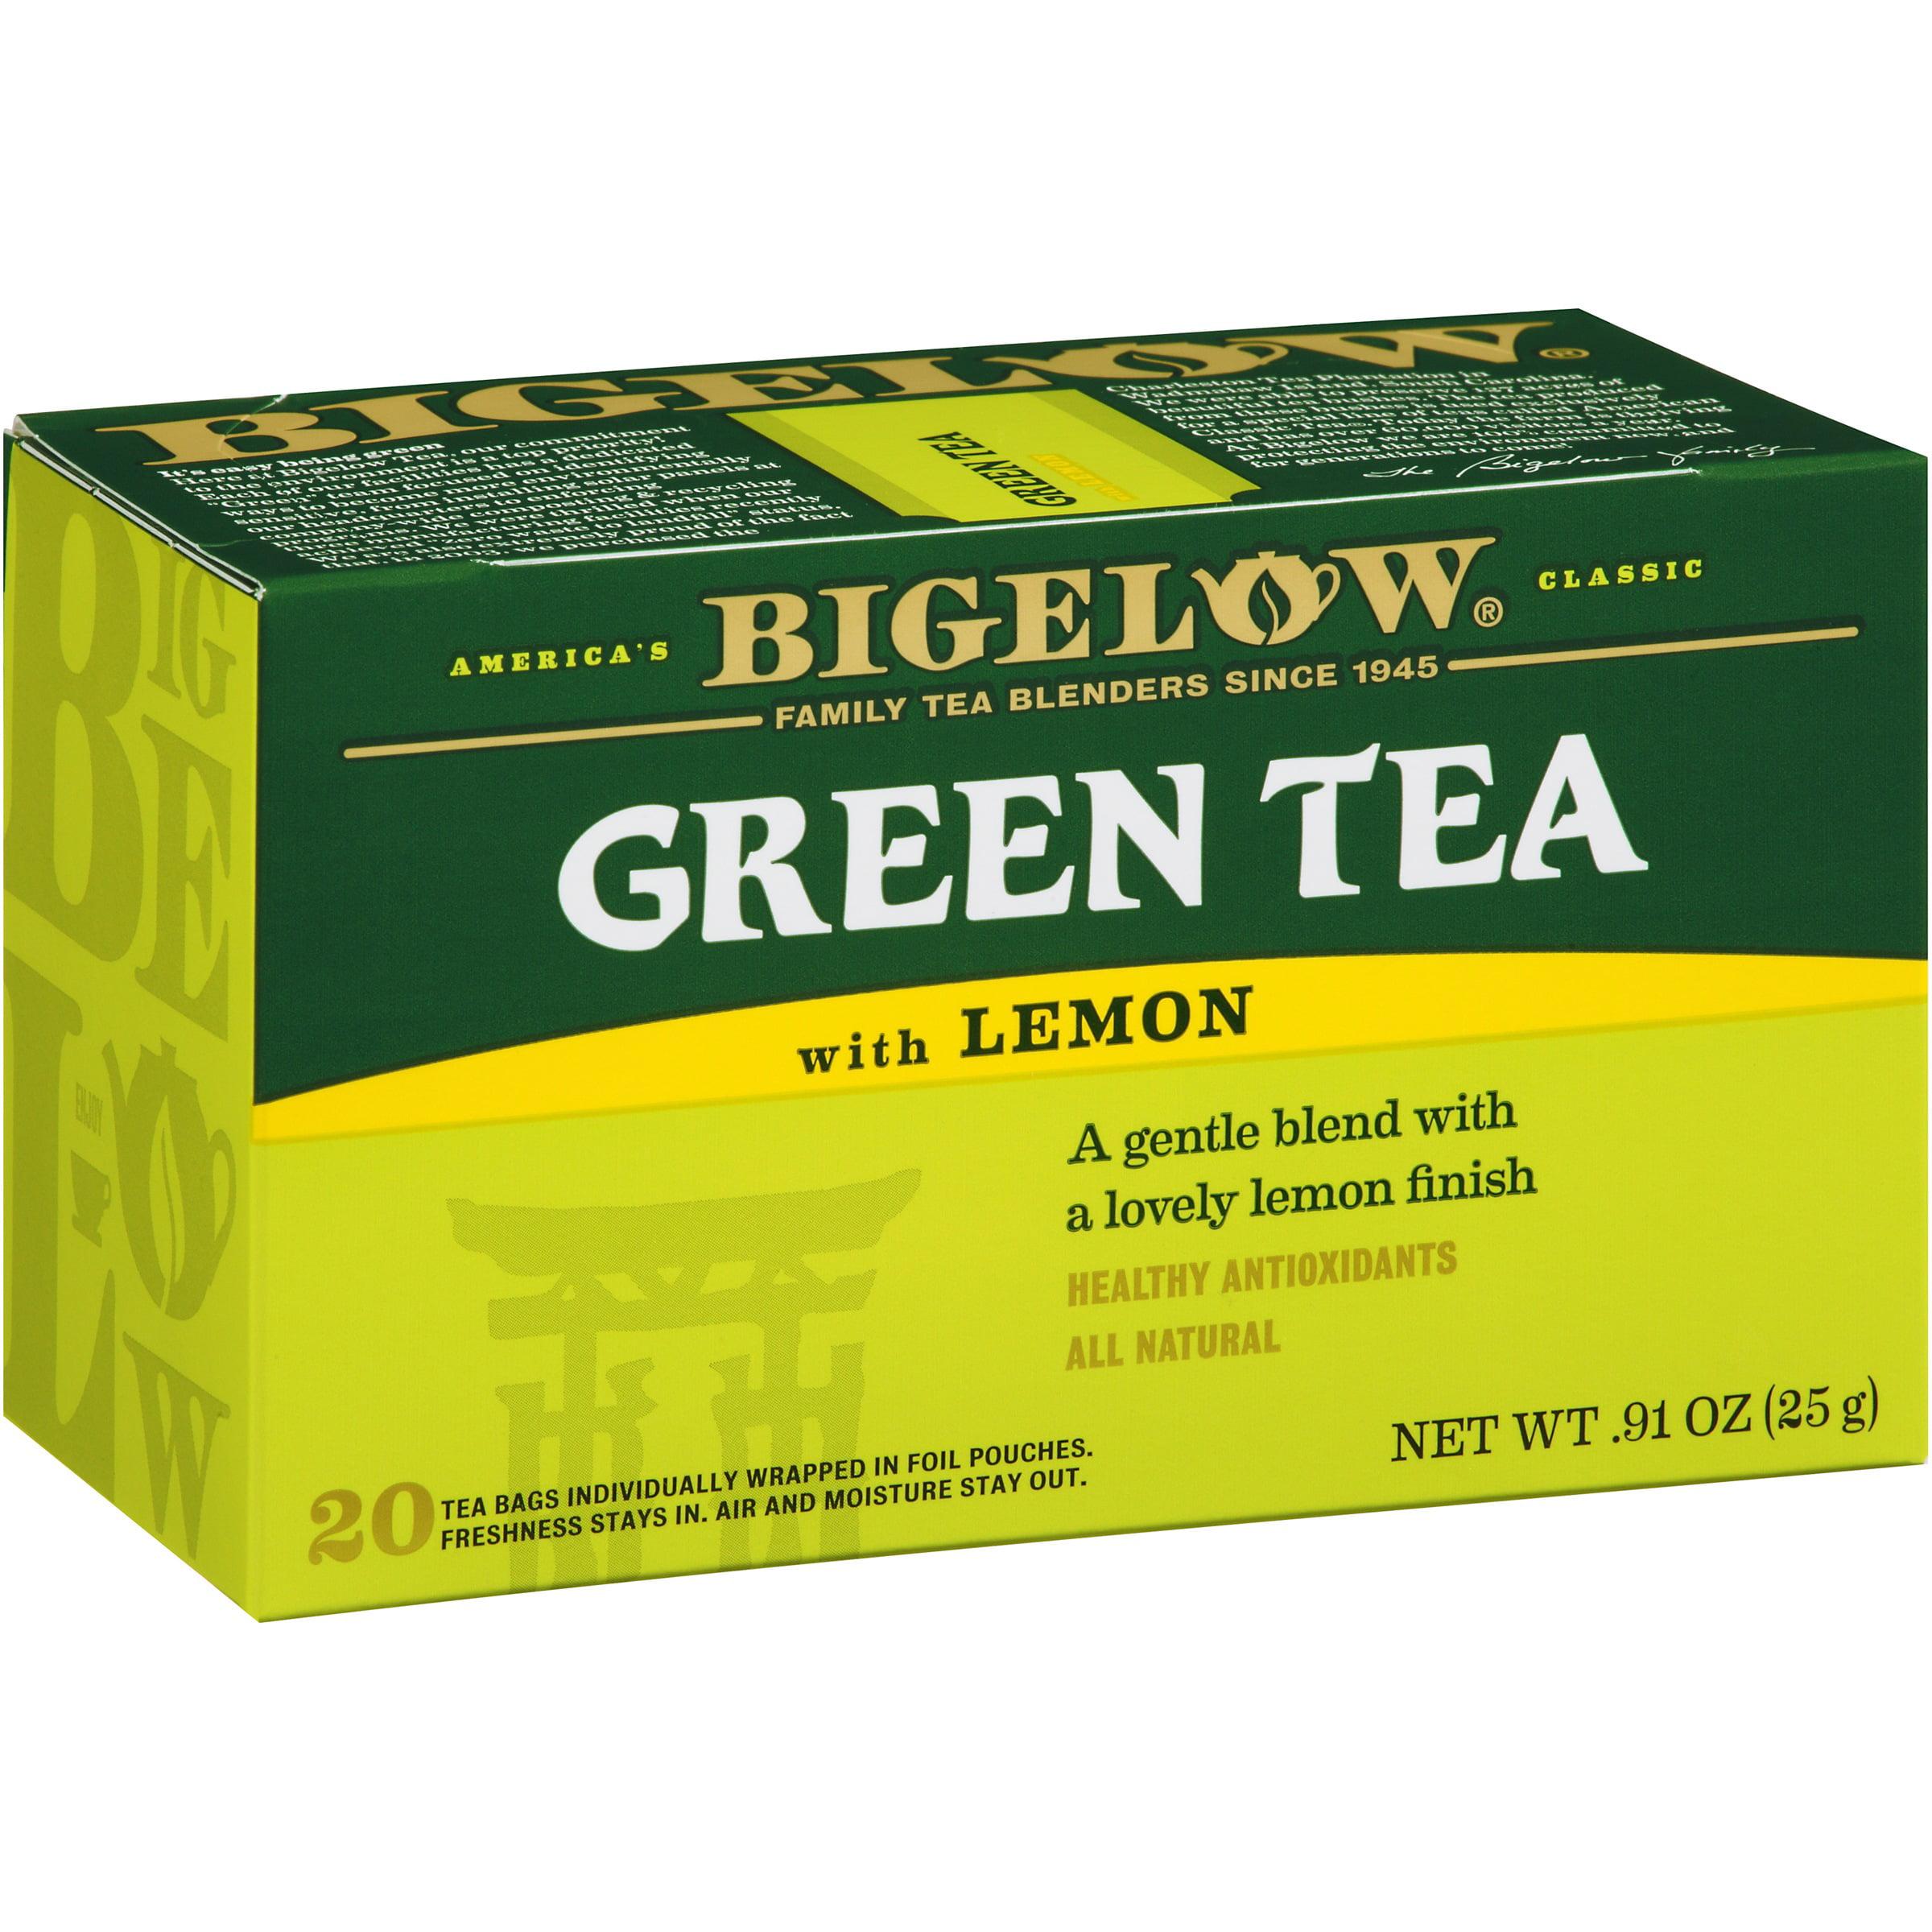 Bigelow Green Tea with Lemon 20 CT by R.C. Bigelow, Inc.